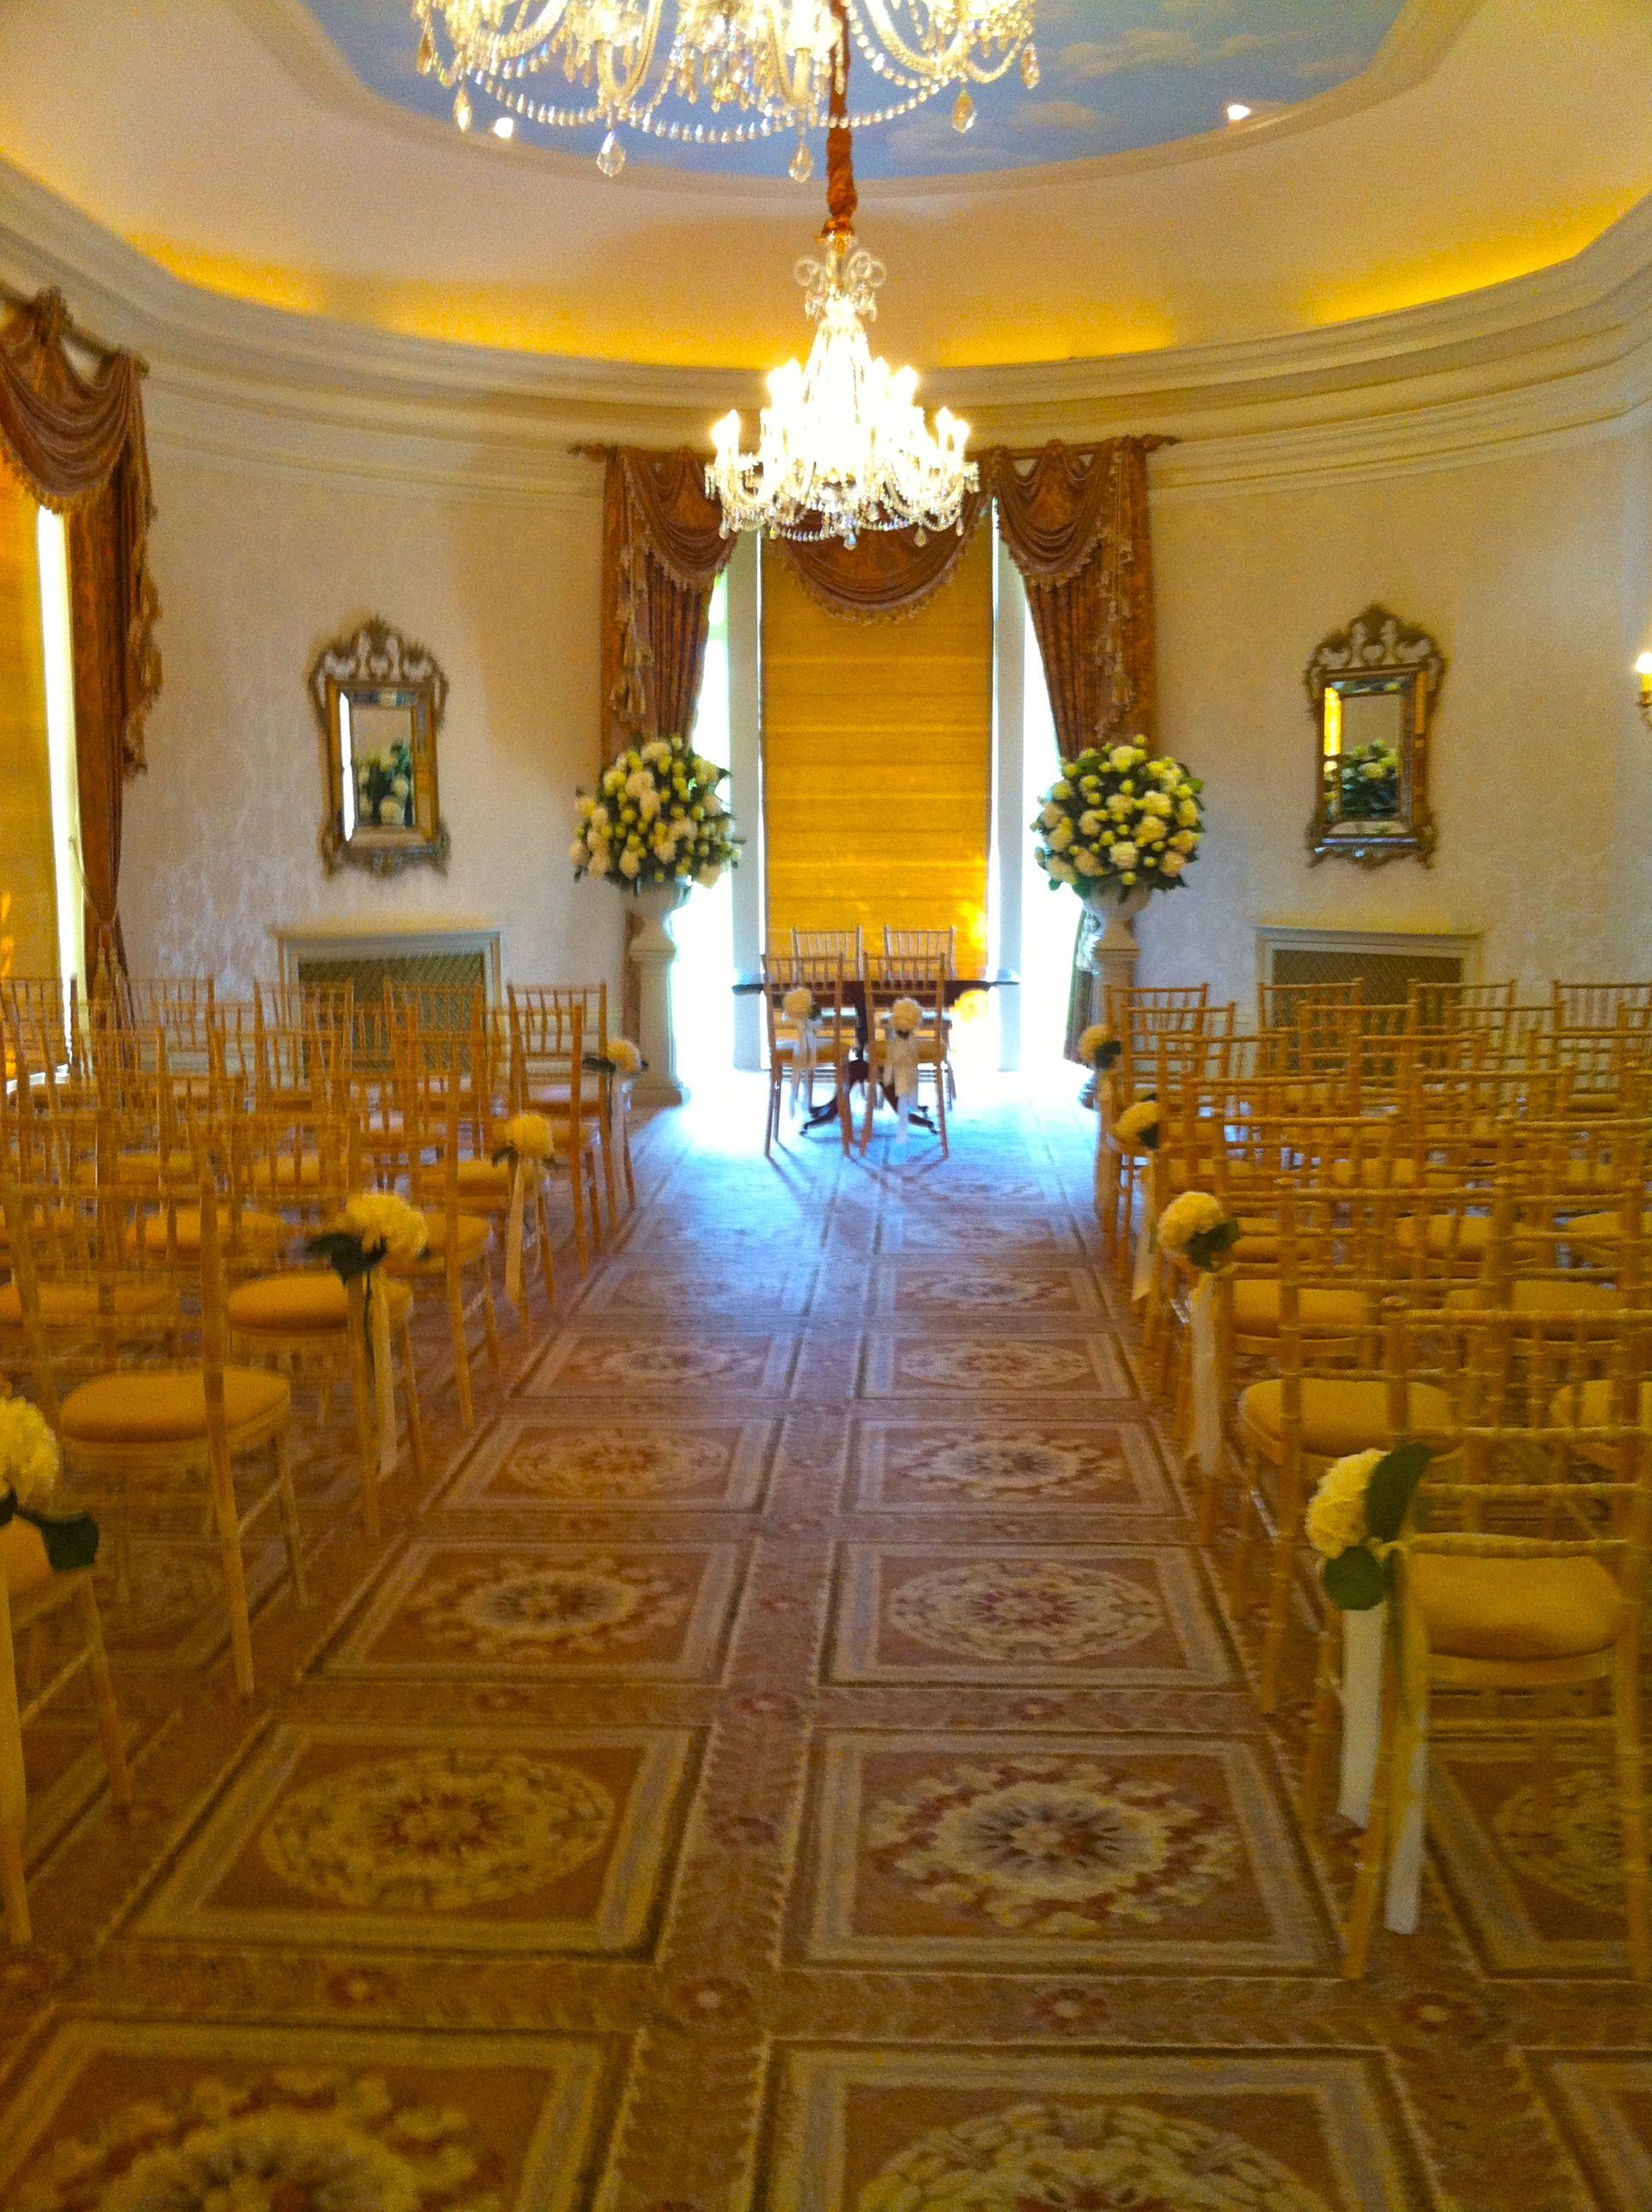 Wedding Venue near Bath England Romantic wedding venue